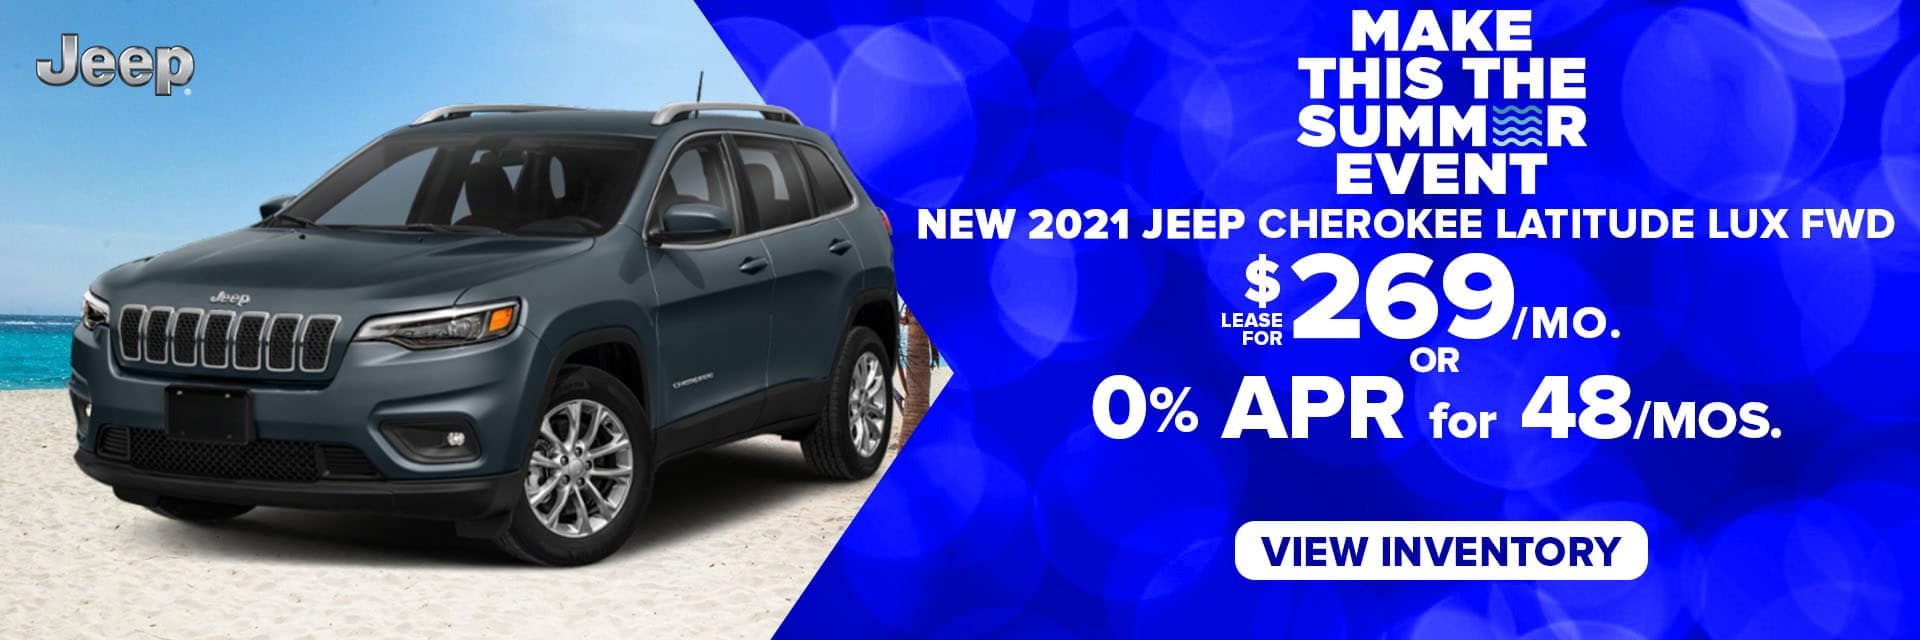 CLCP-July 2021-2021 Jeep Cherokee copy